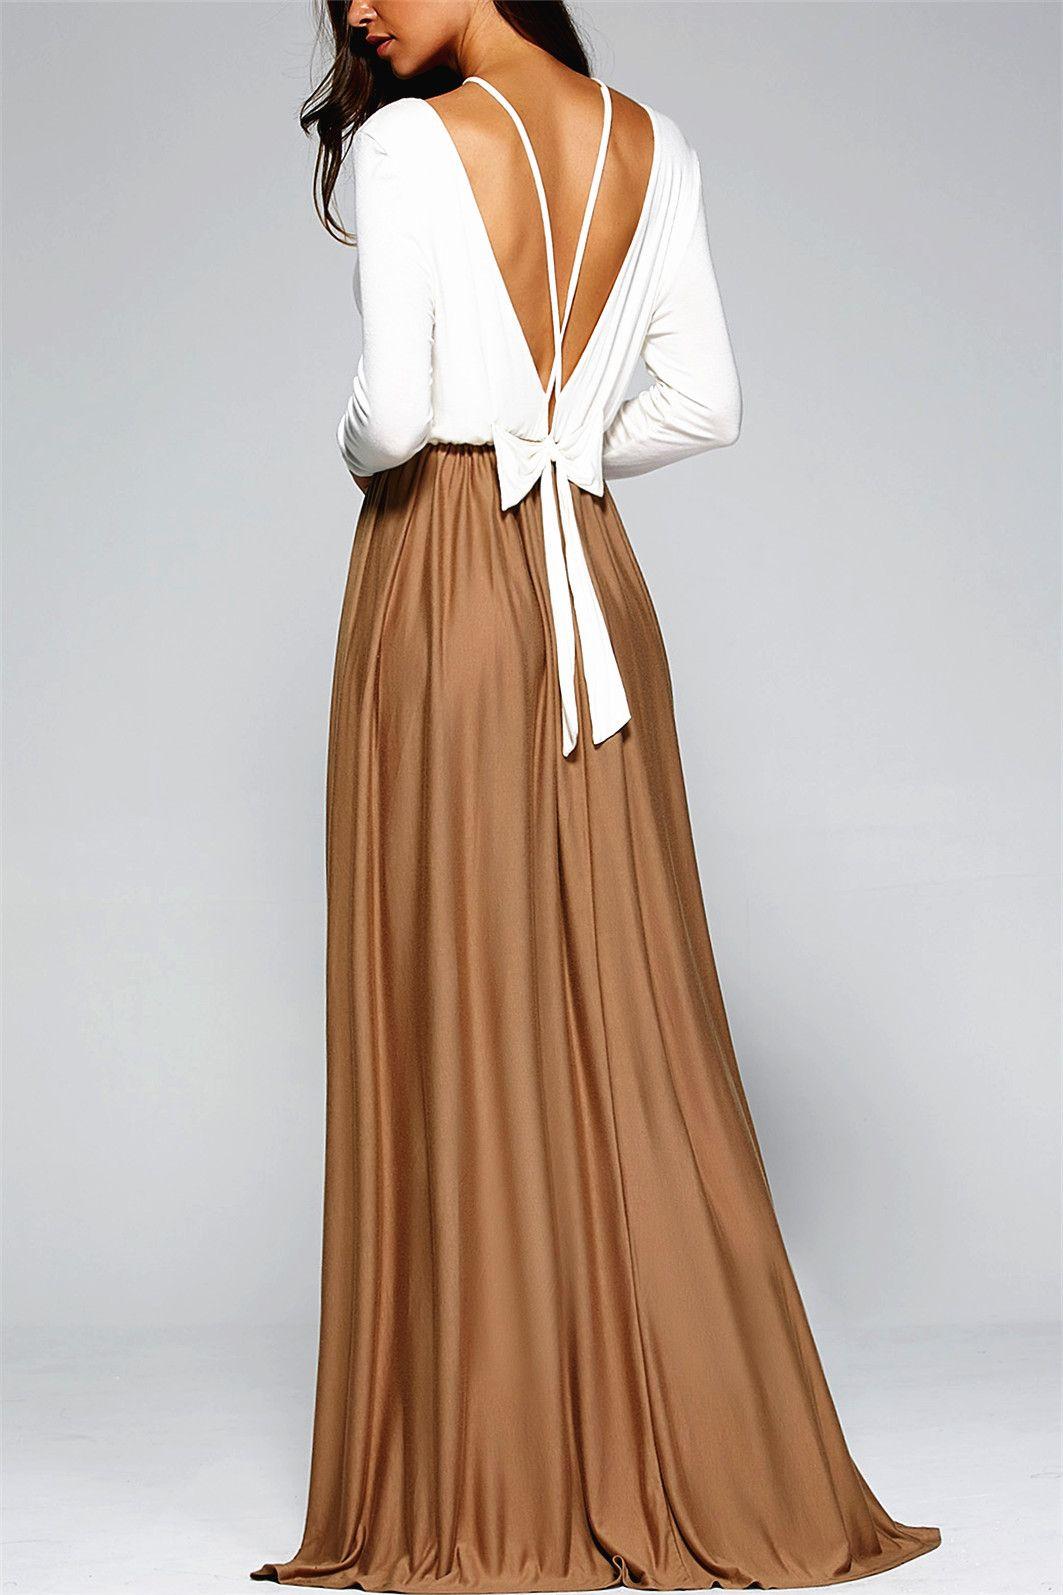 fashionable long sleeve laceup backless maxi dress wedding